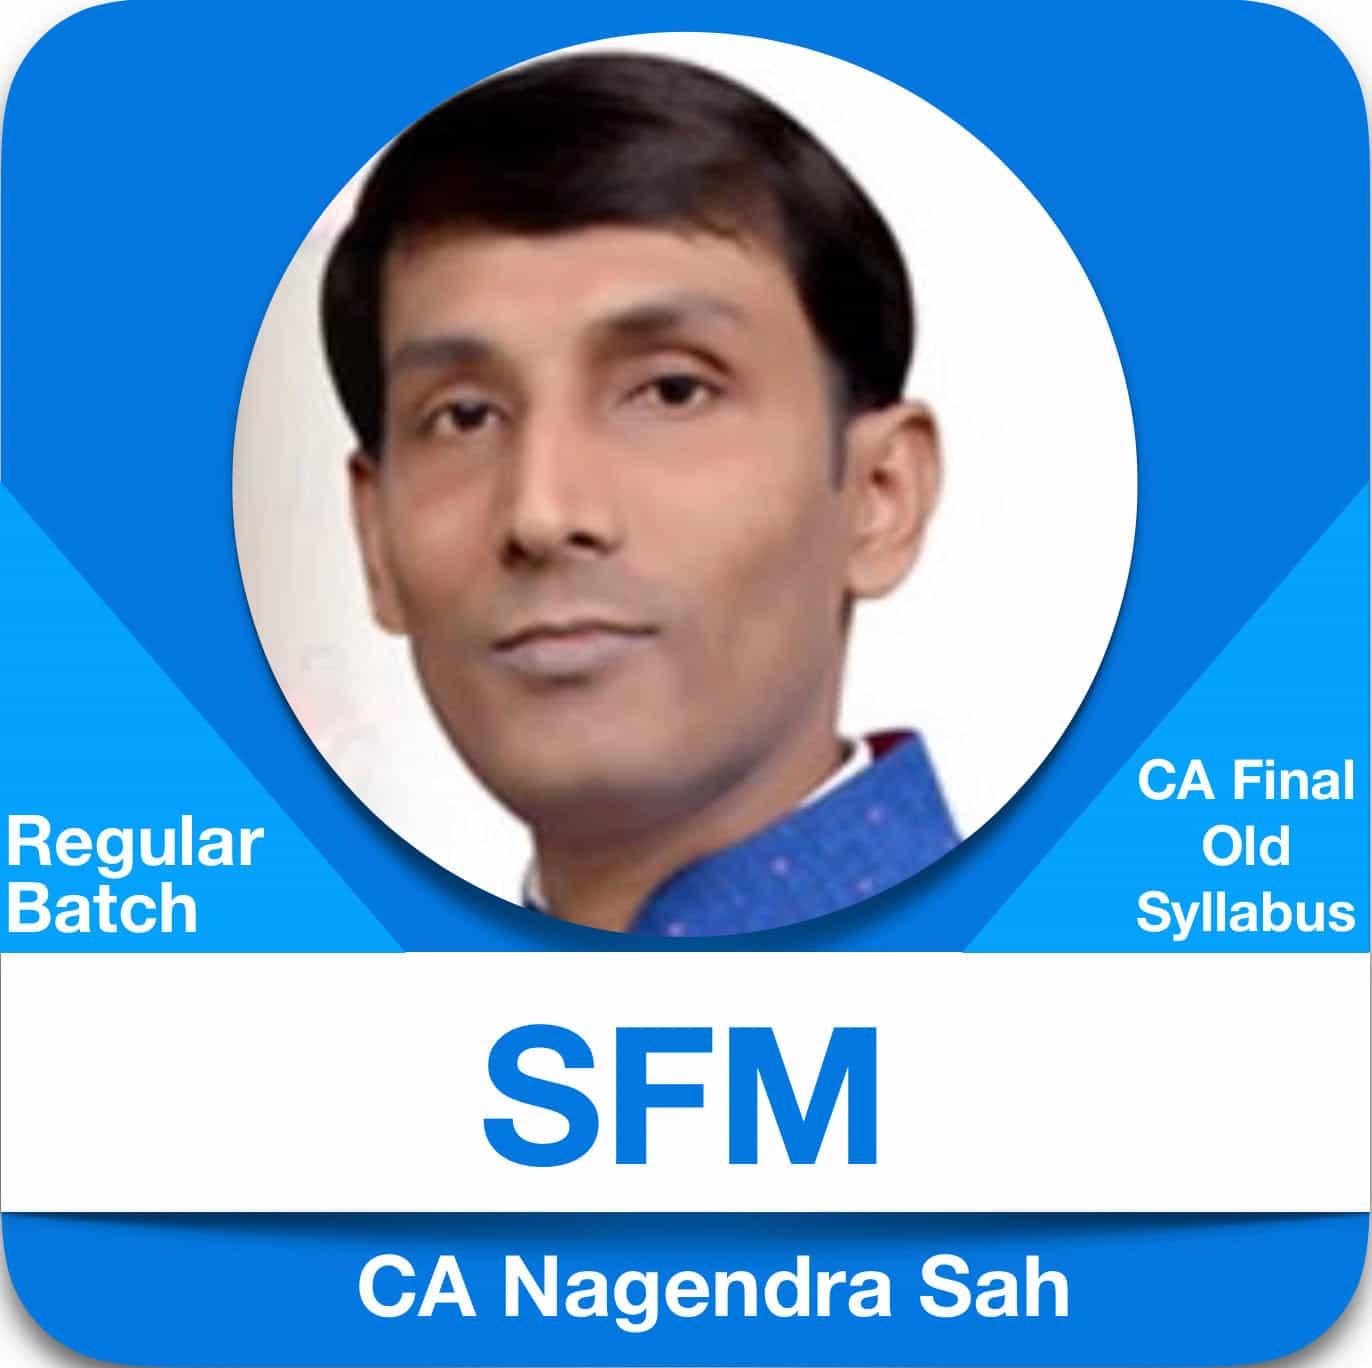 SFM Regular Batch